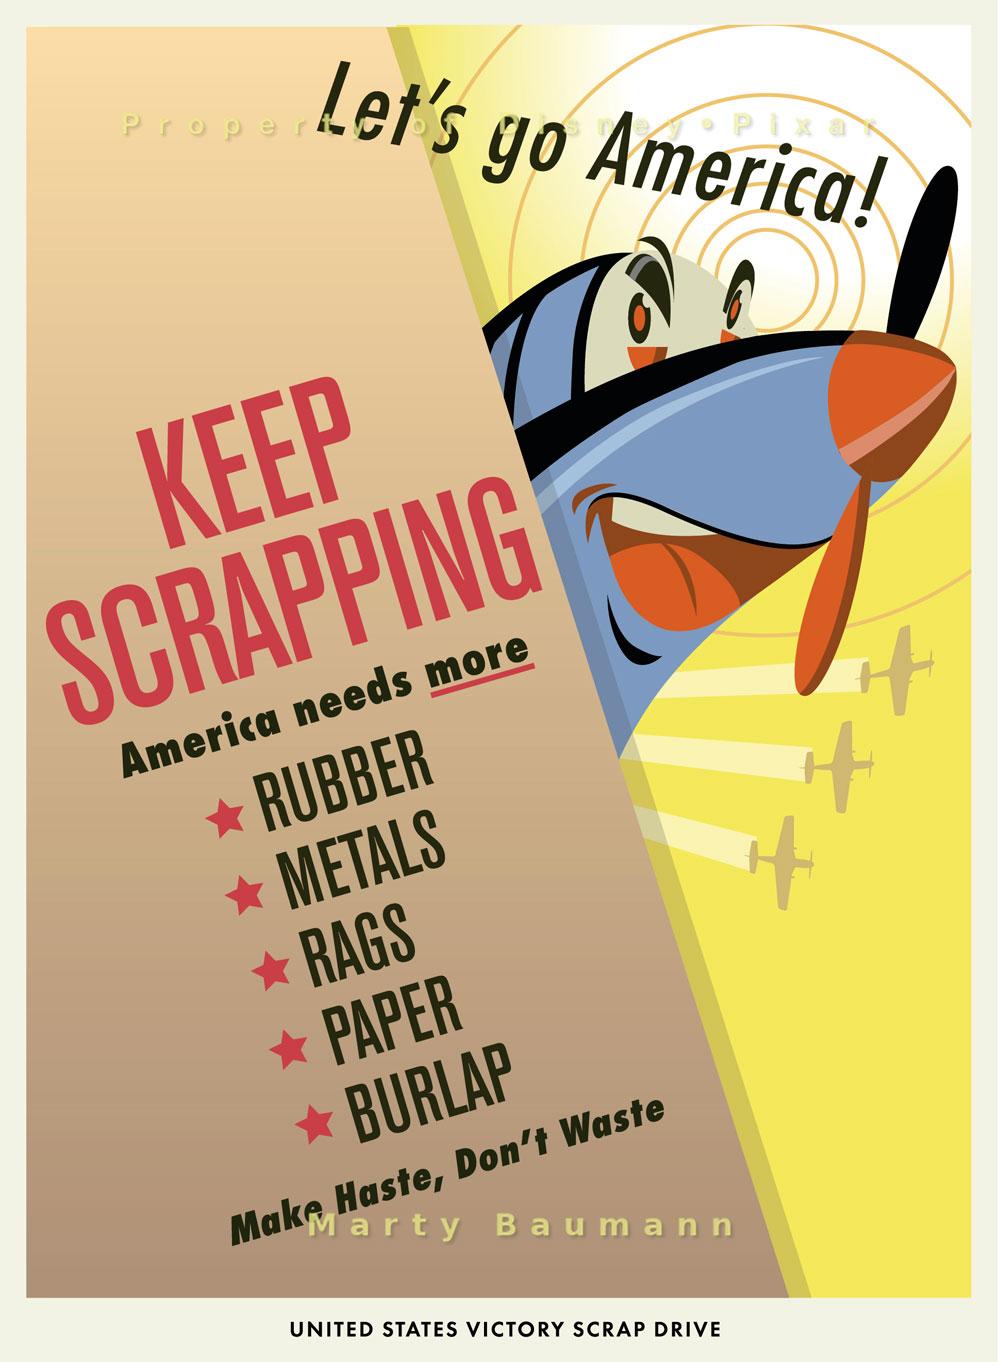 Pixar - Keep Scrapping